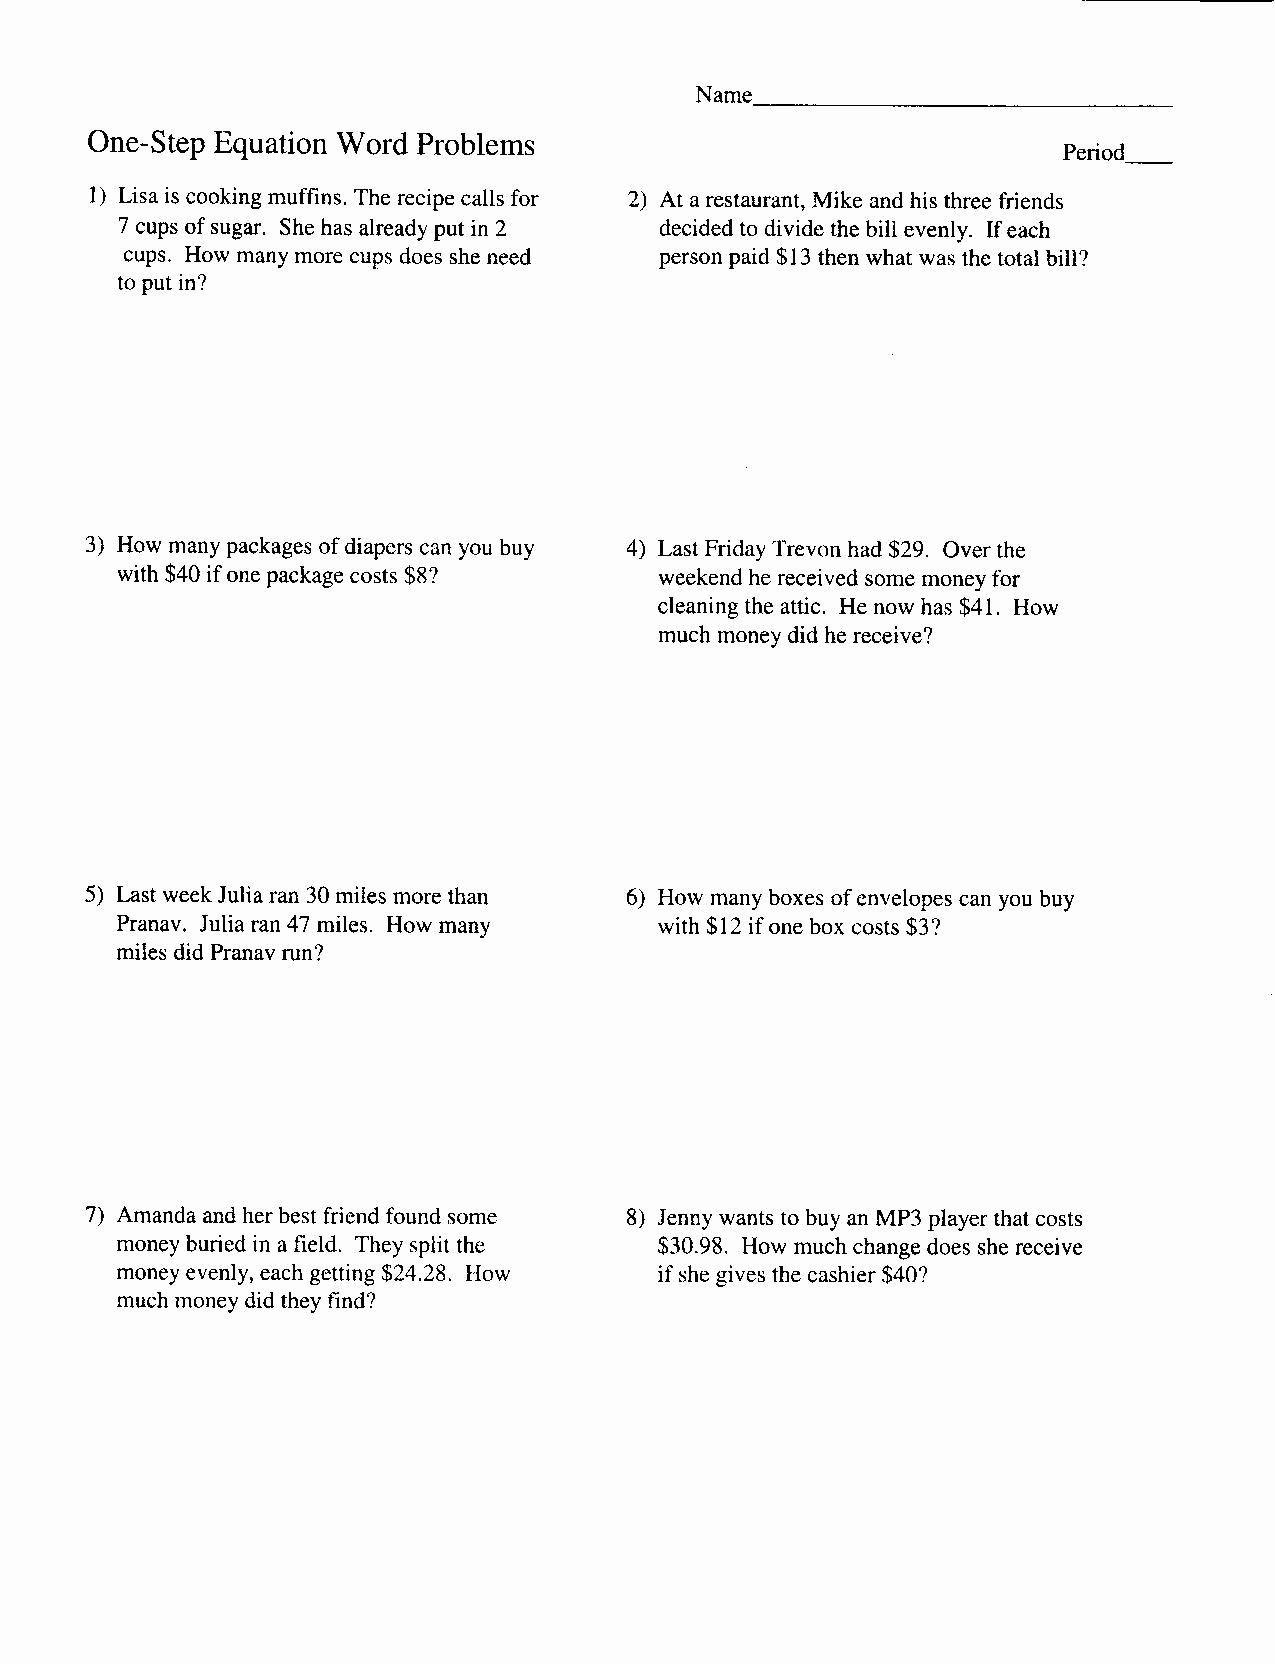 Algebra Word Problems Worksheet Pdf Algebra Word Problems Worksheet Pdf Inspirational Two Step